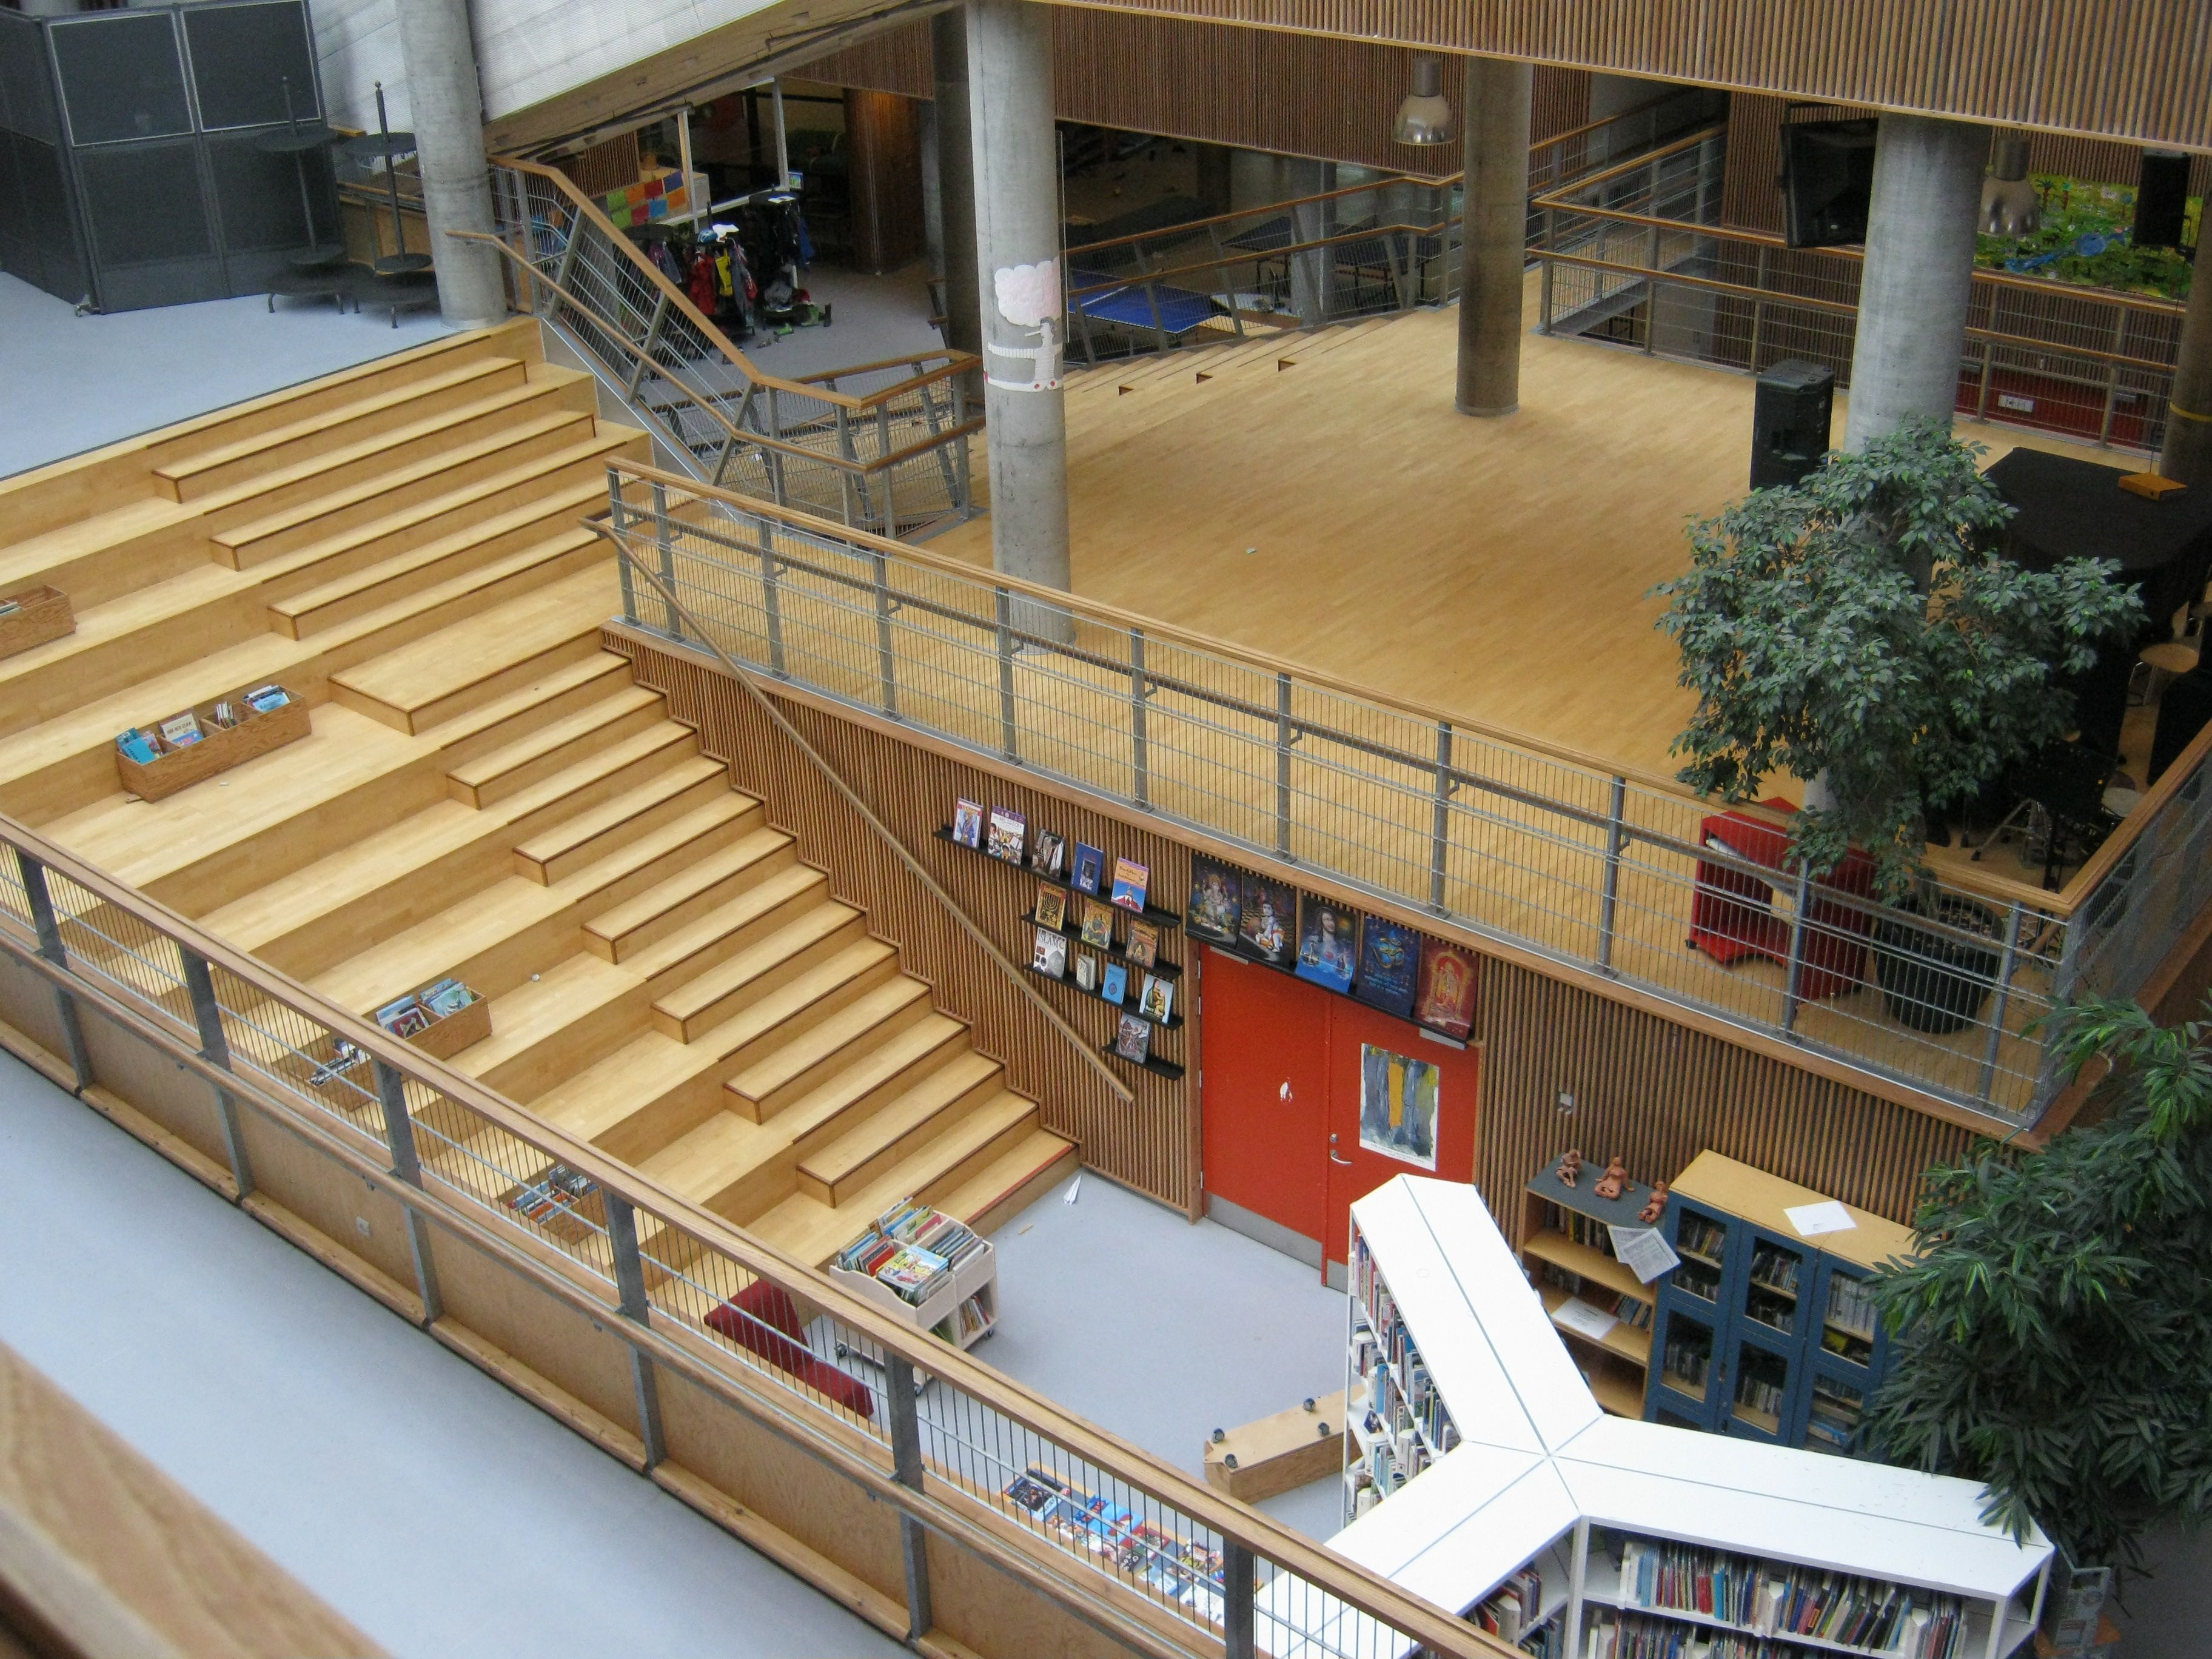 Hellerup skole google search high schools school - Architecture and interior design schools ...